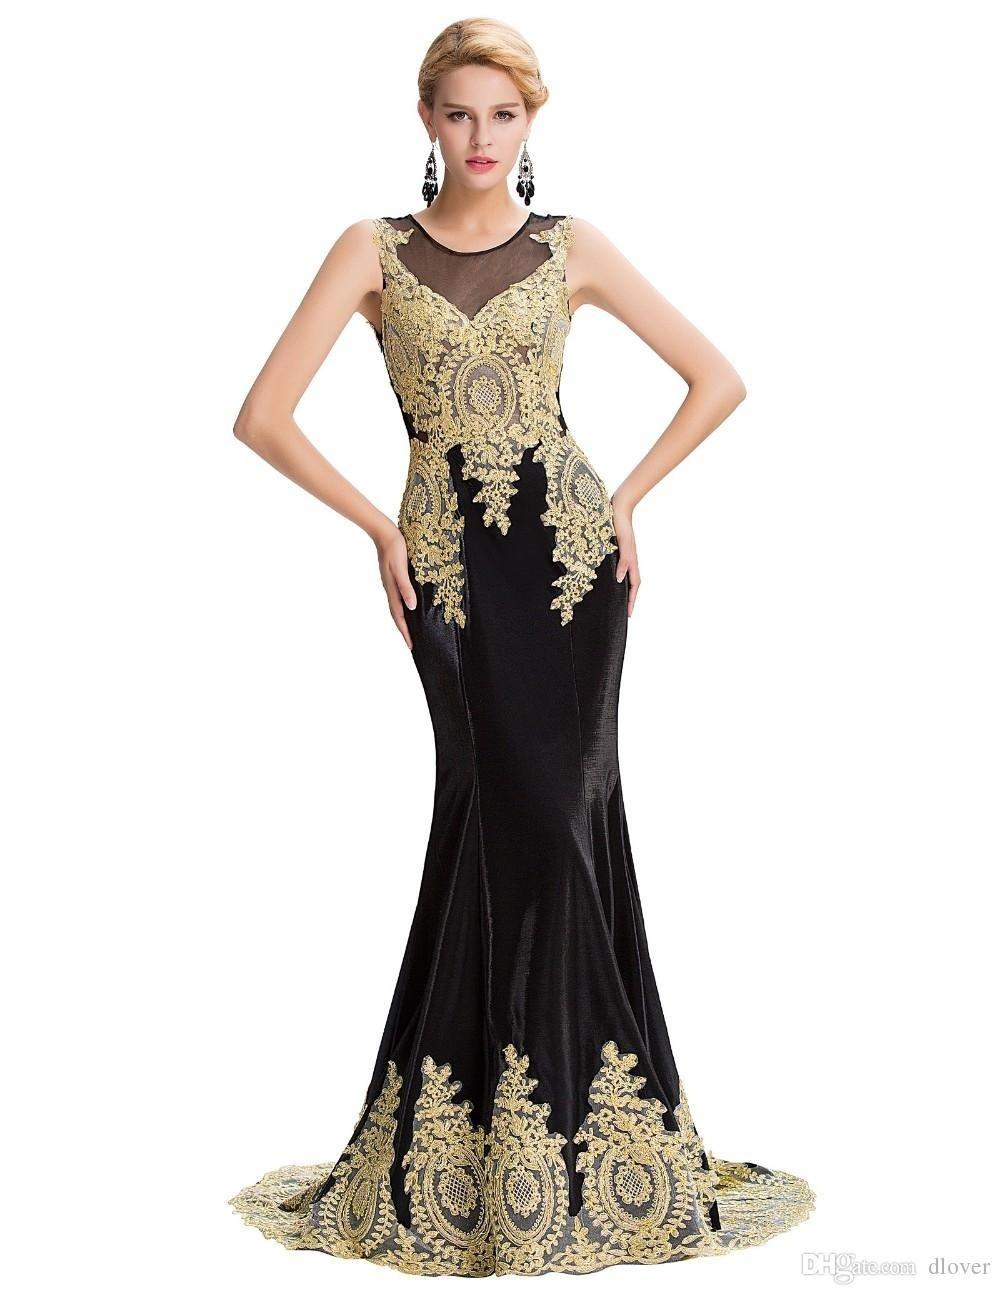 Formal Luxus Abendkleid Lang Schwarz Gold Boutique Großartig Abendkleid Lang Schwarz Gold Bester Preis